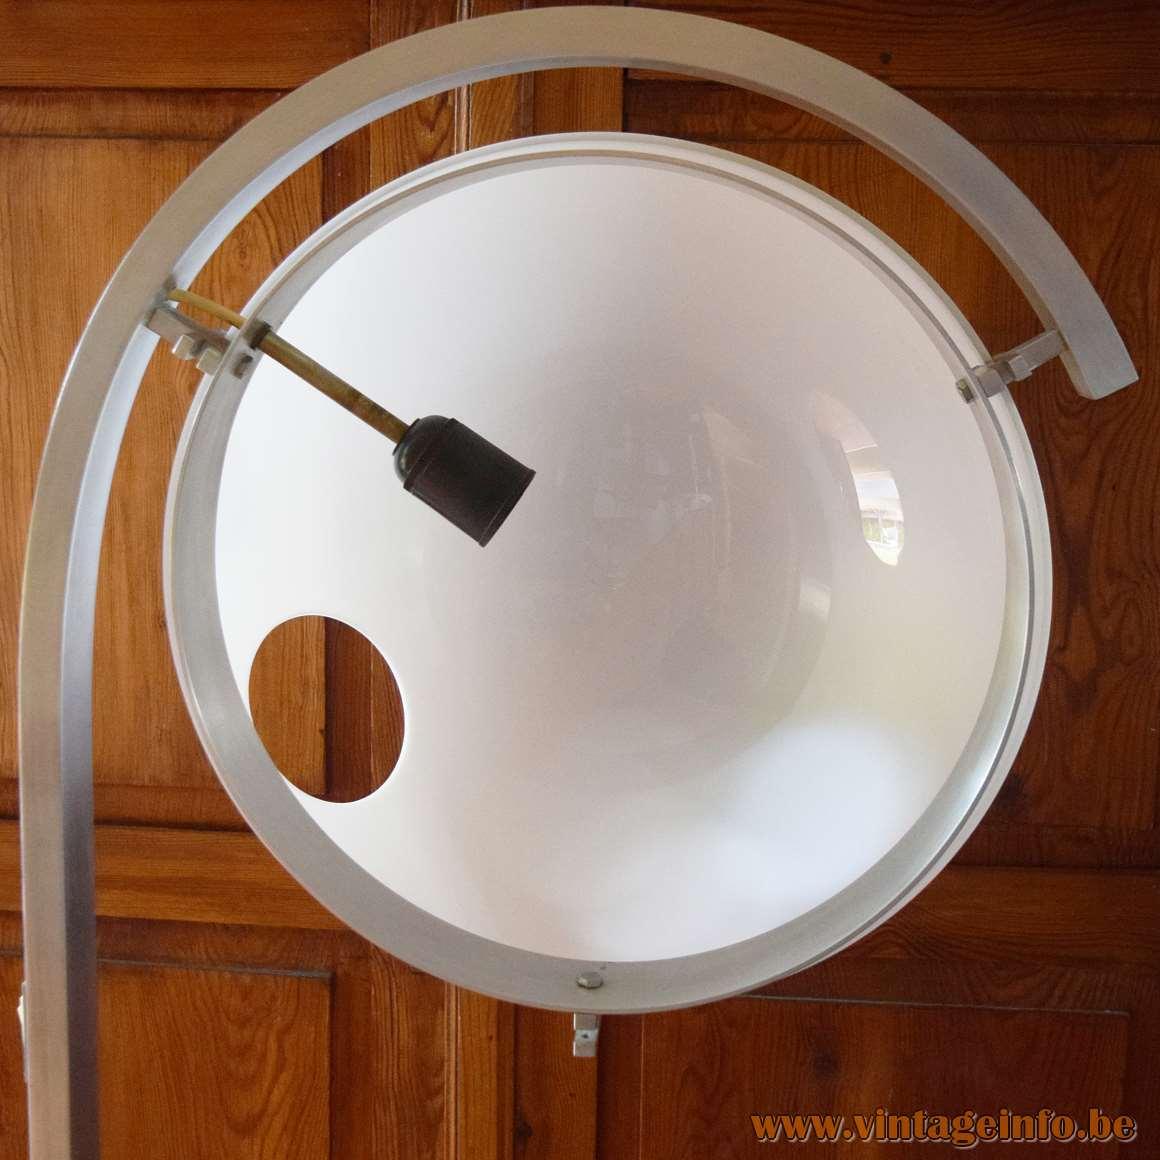 Acrylic Globe Floor Lamp - inside